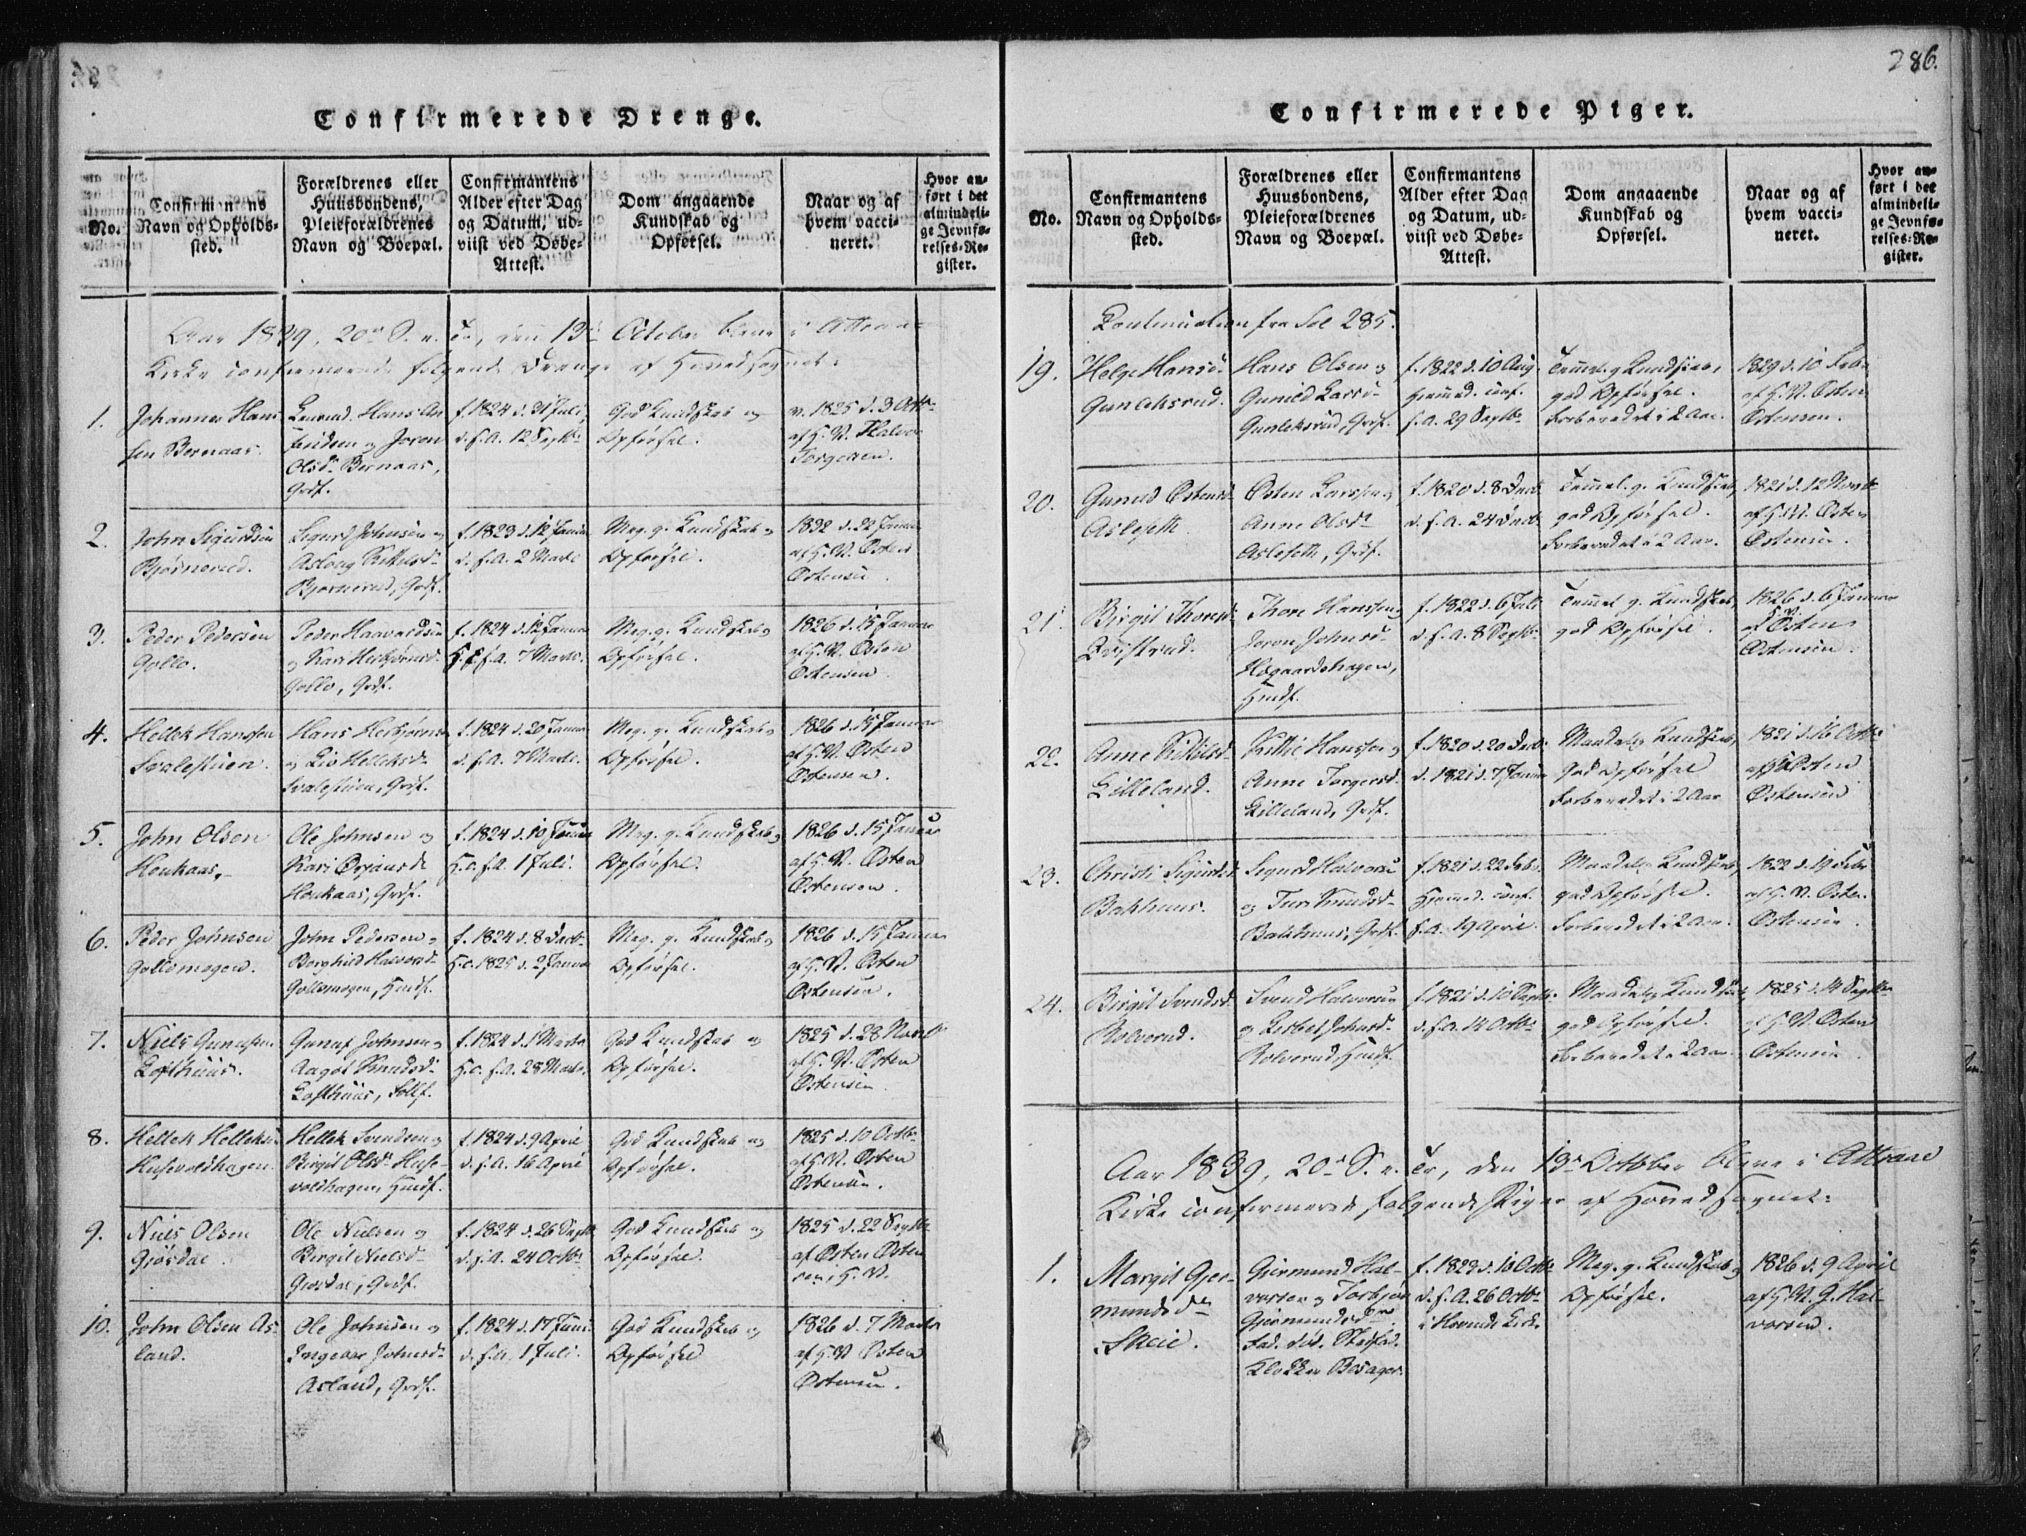 SAKO, Tinn kirkebøker, F/Fa/L0004: Ministerialbok nr. I 4, 1815-1843, s. 286